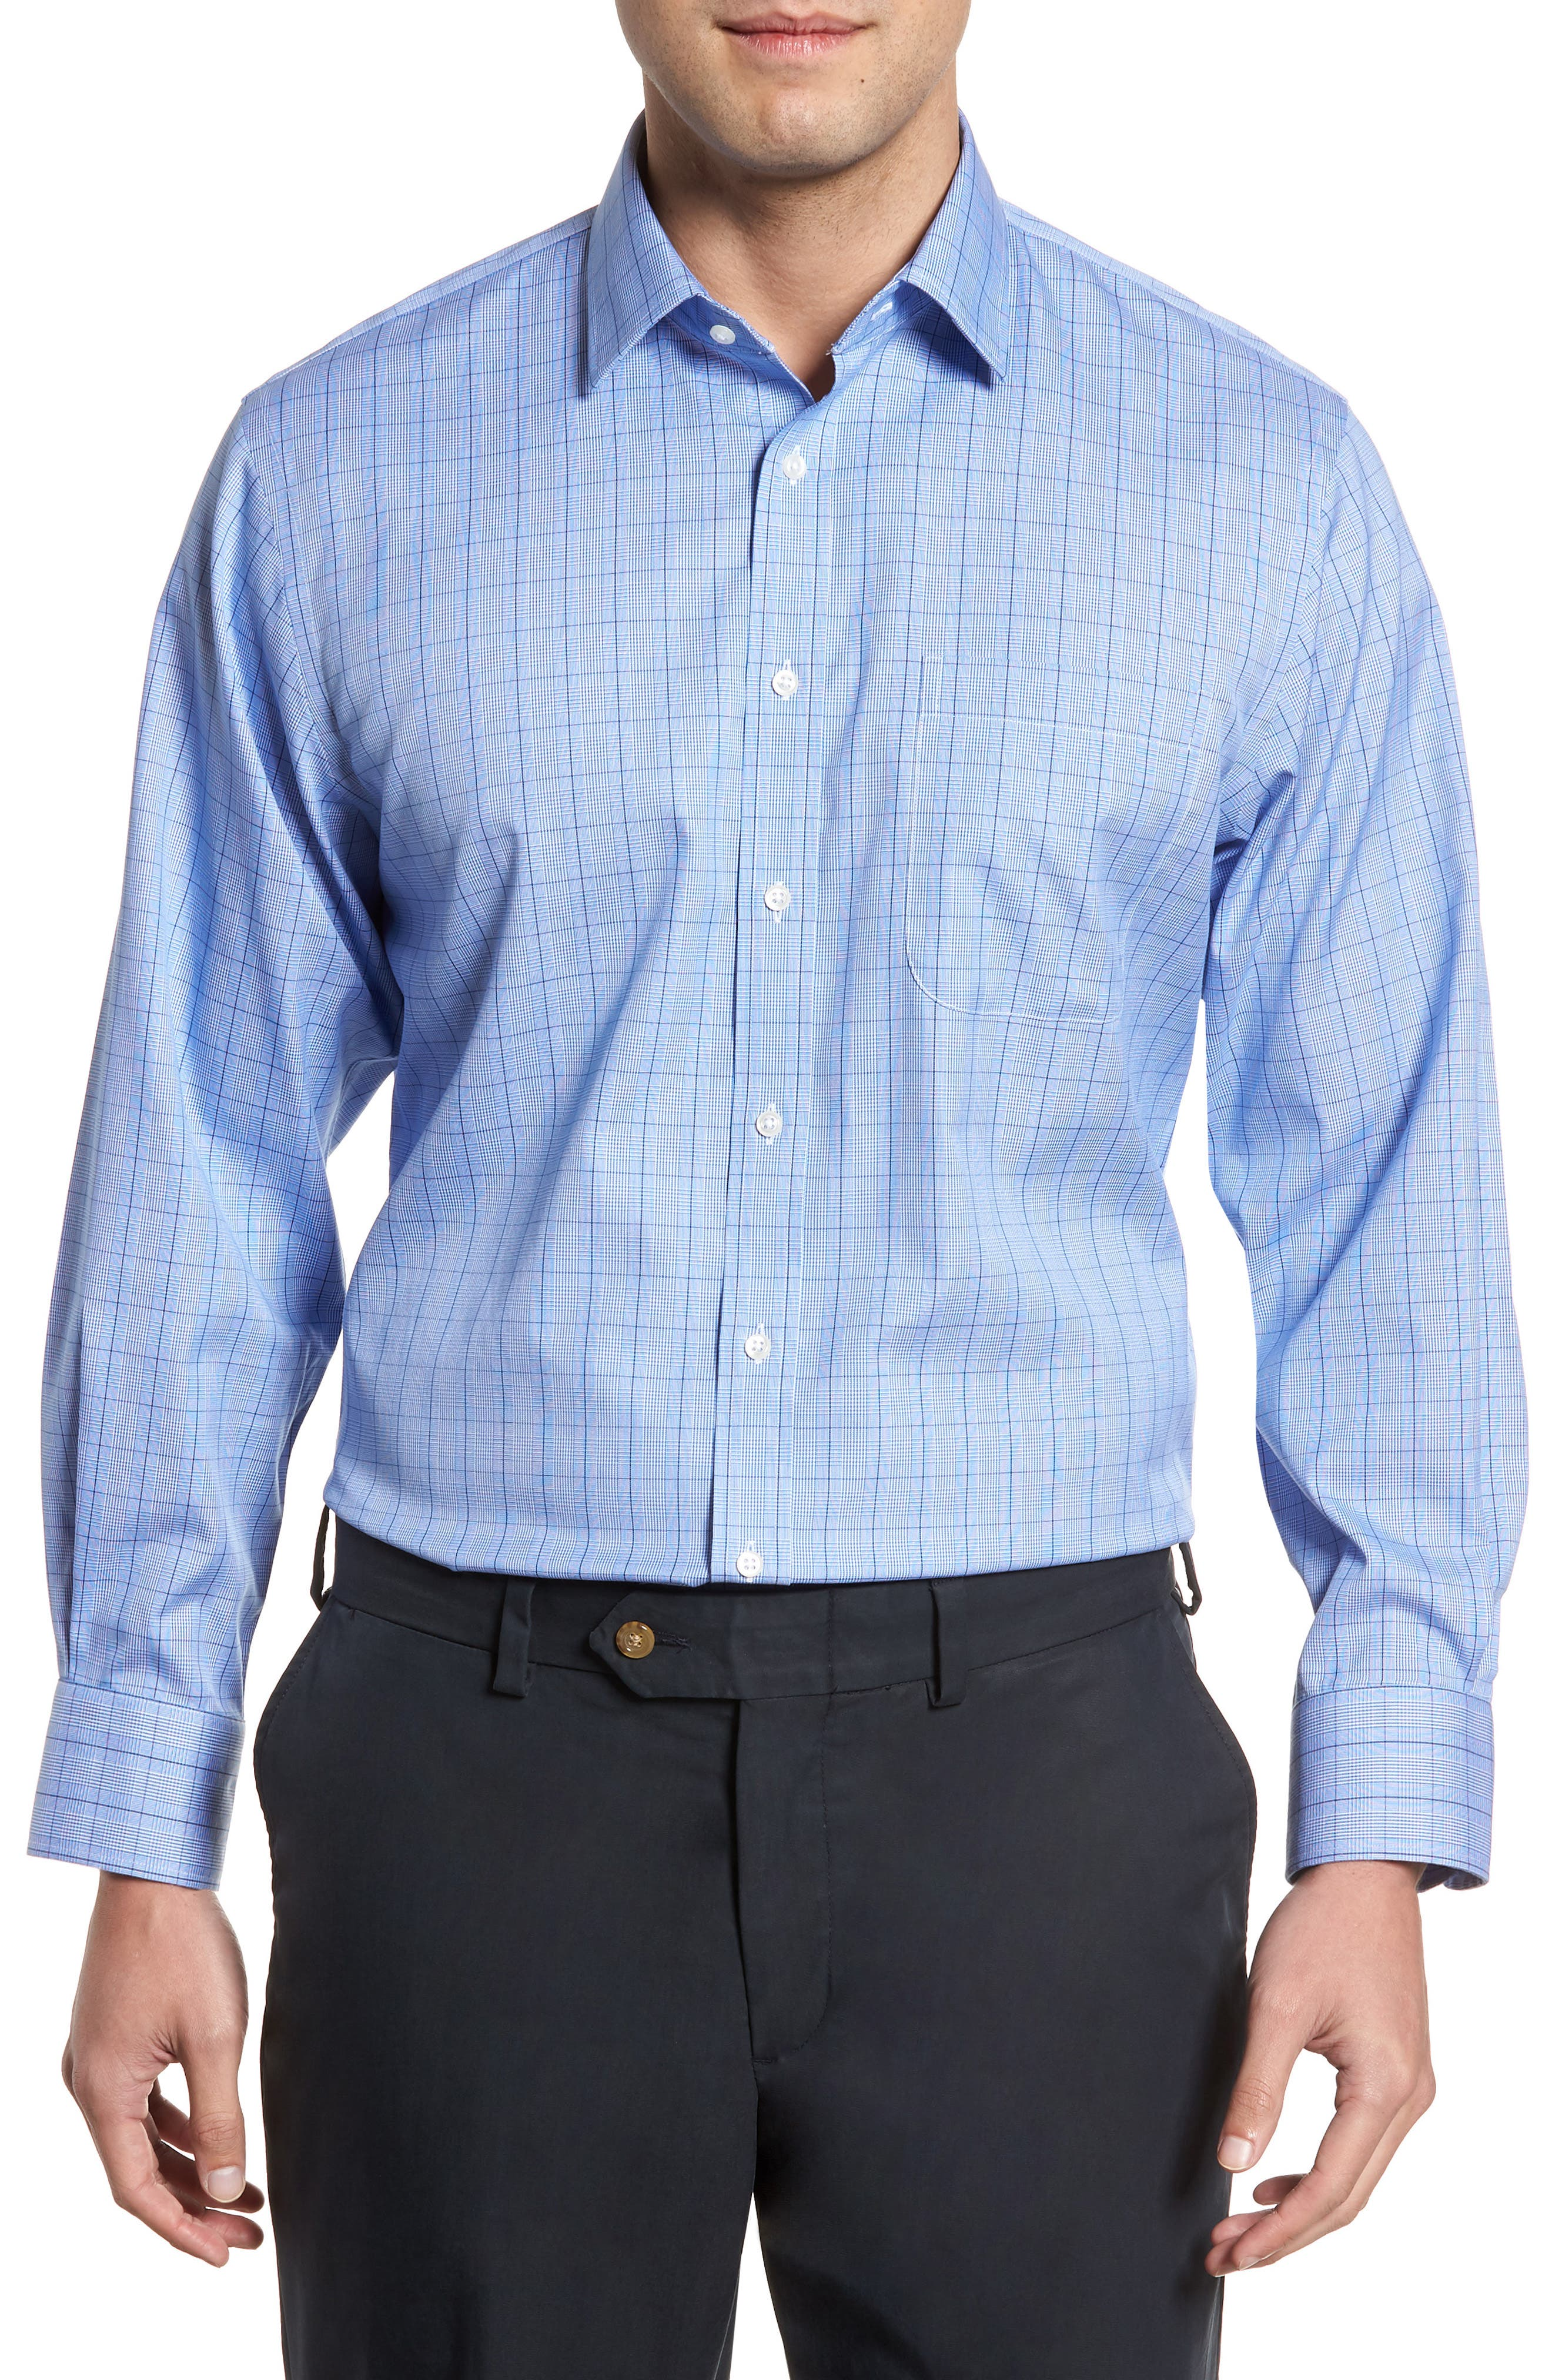 Alternate Image 1 Selected - Nordstrom Men's Shop Smartcare™ Traditional Fit Windowpane Dress Shirt